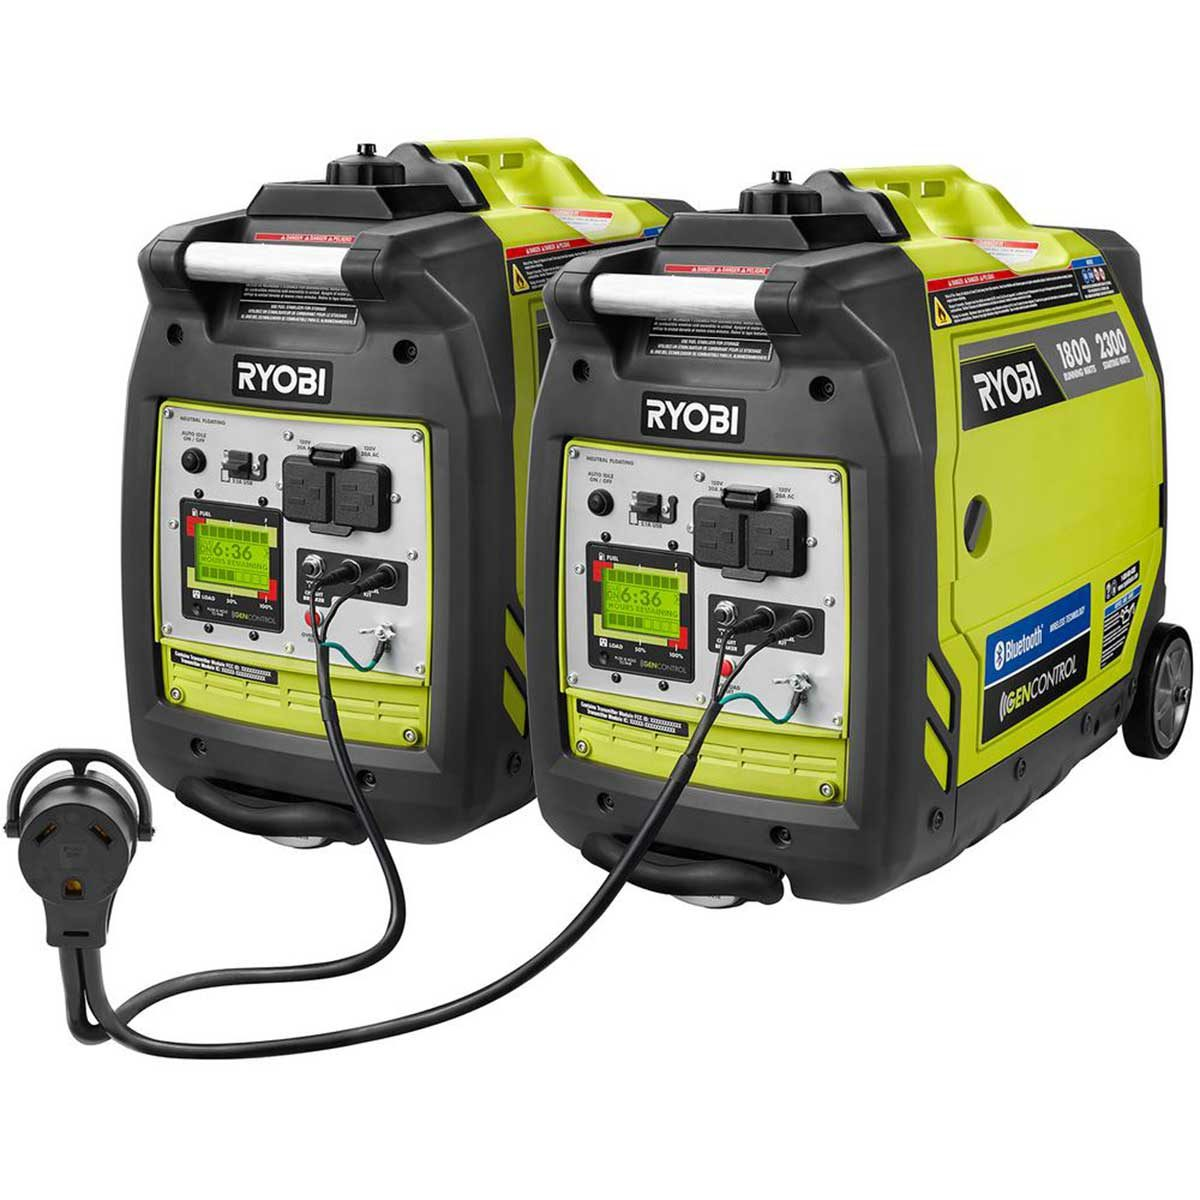 Photo of Ryobi generators